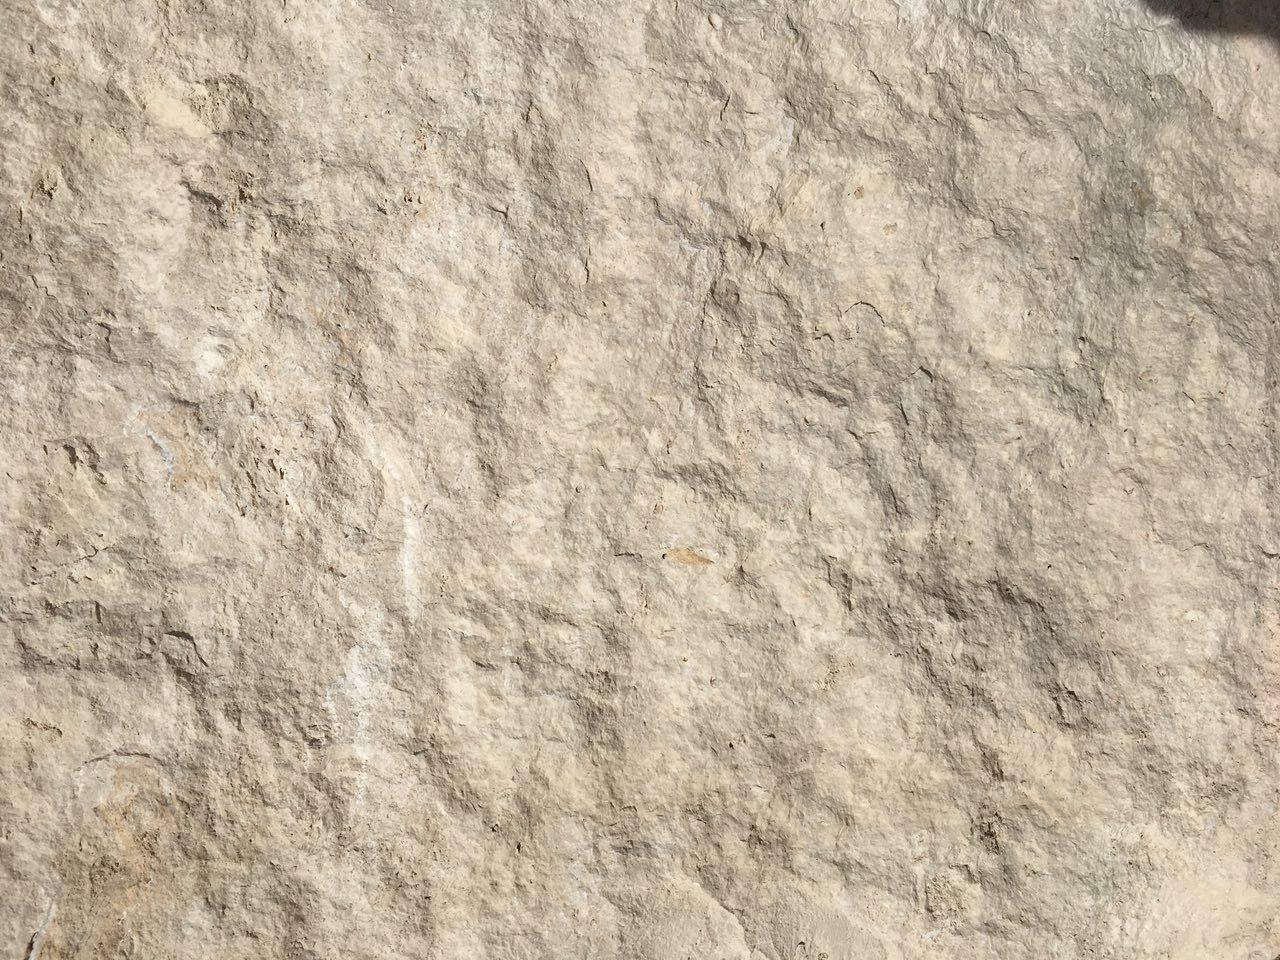 سنگ کوپ تراورتن حاجی آباد